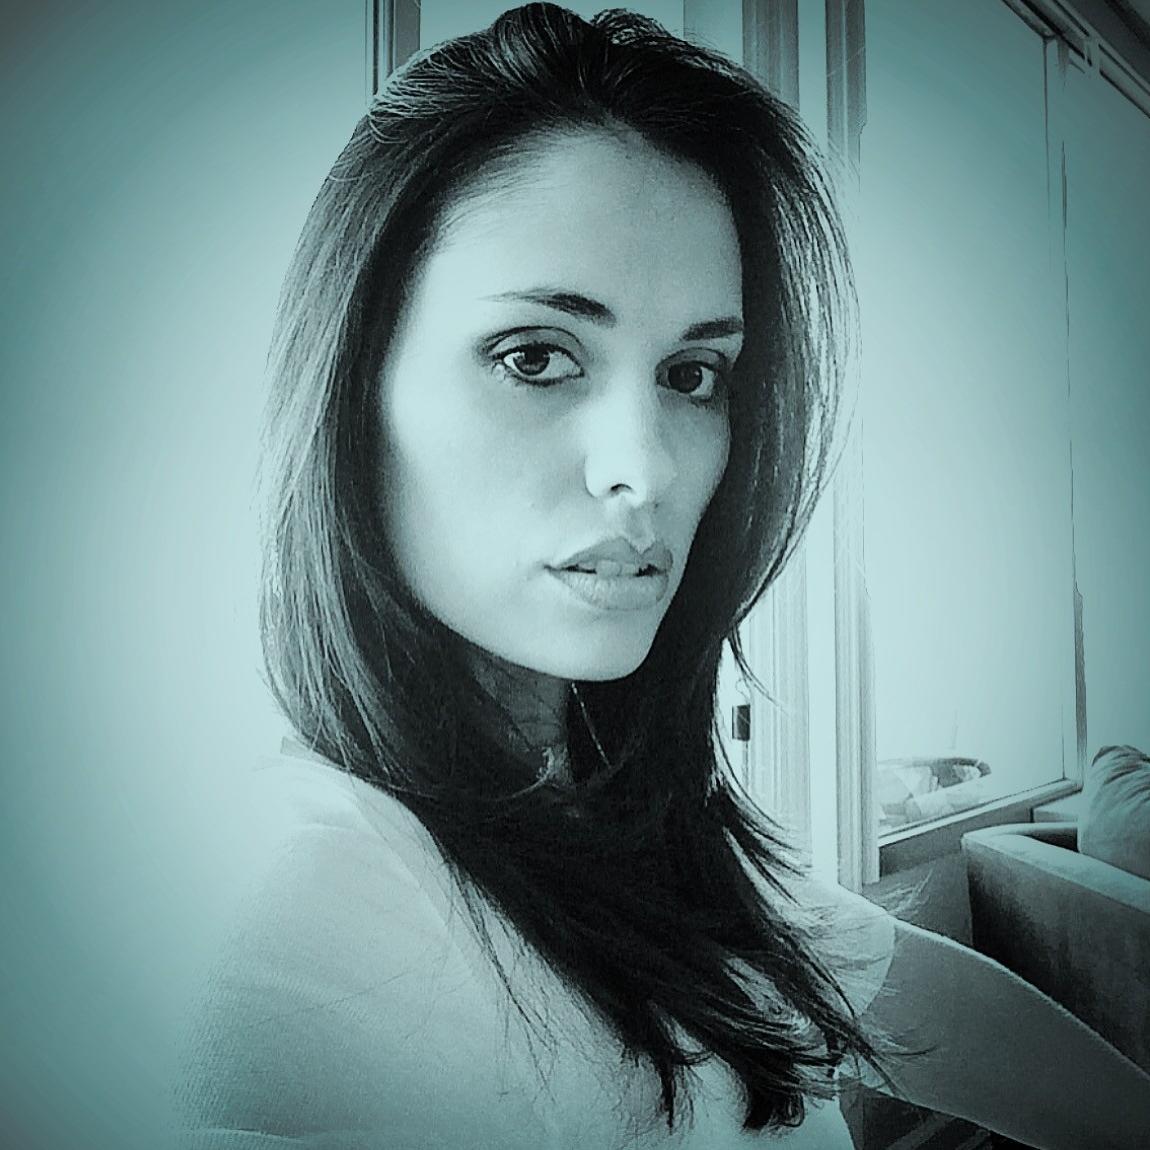 Anna's User Image